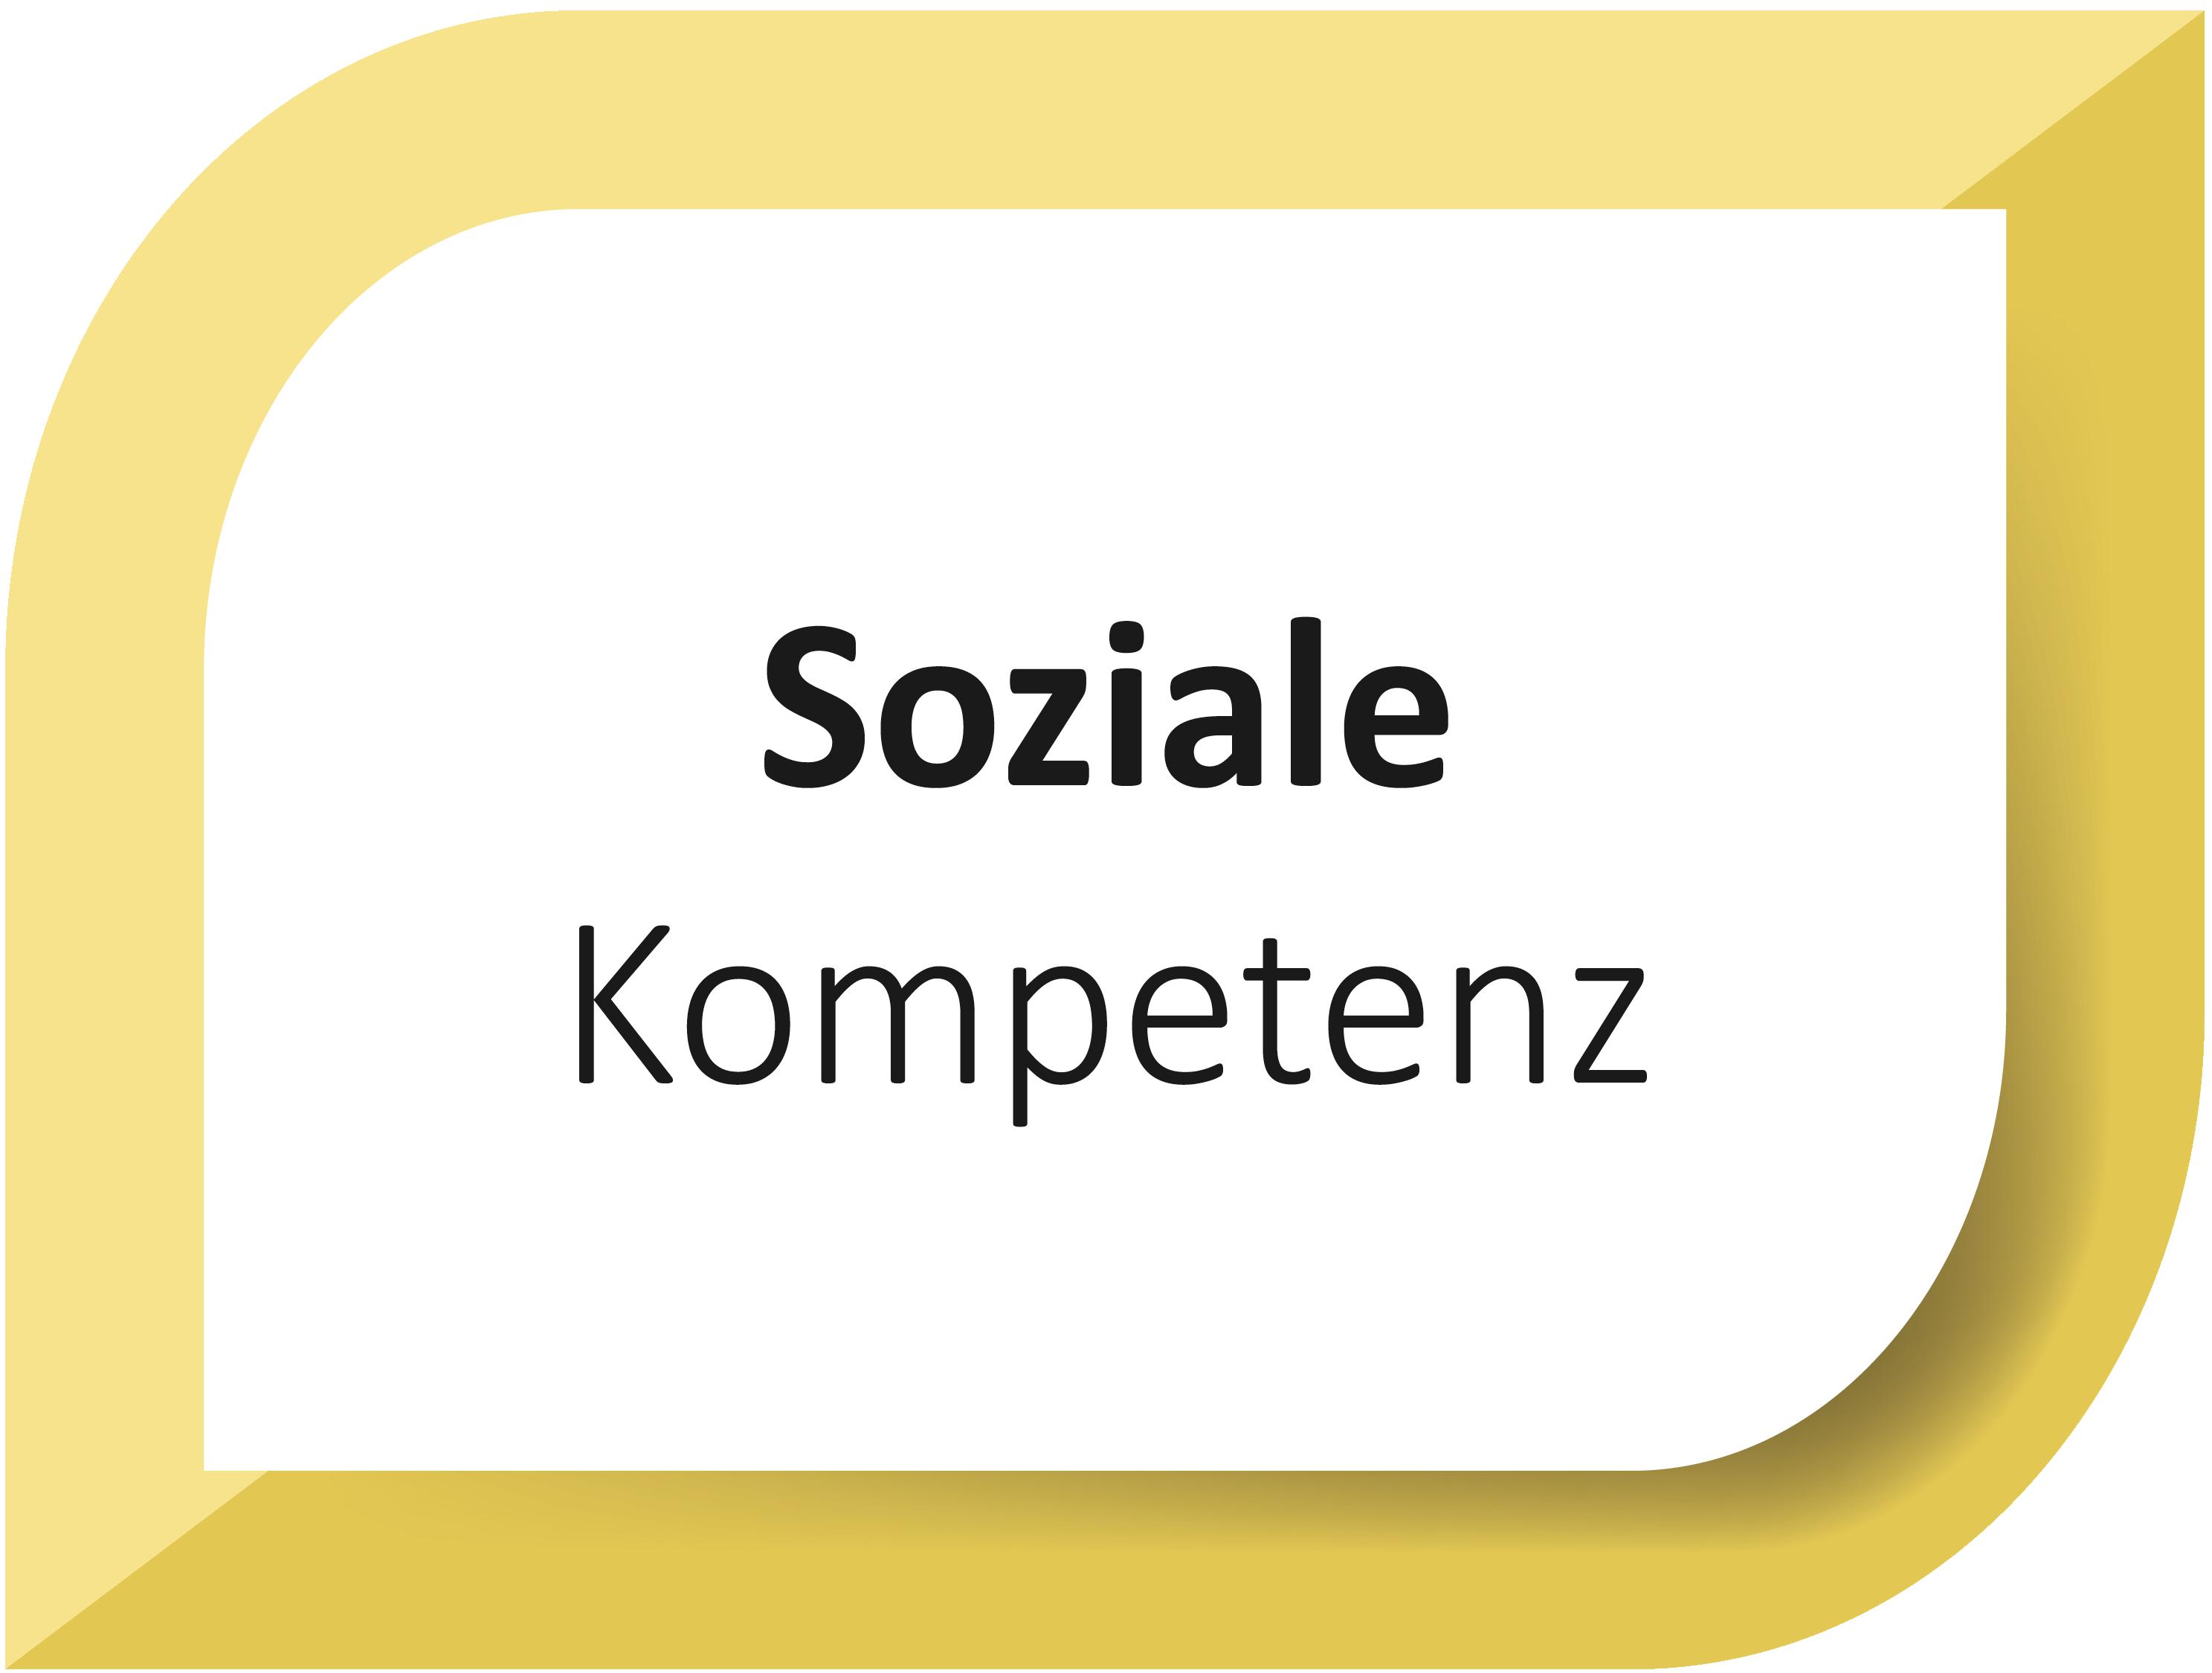 Button-Pastell_Soziale-Kompetenz